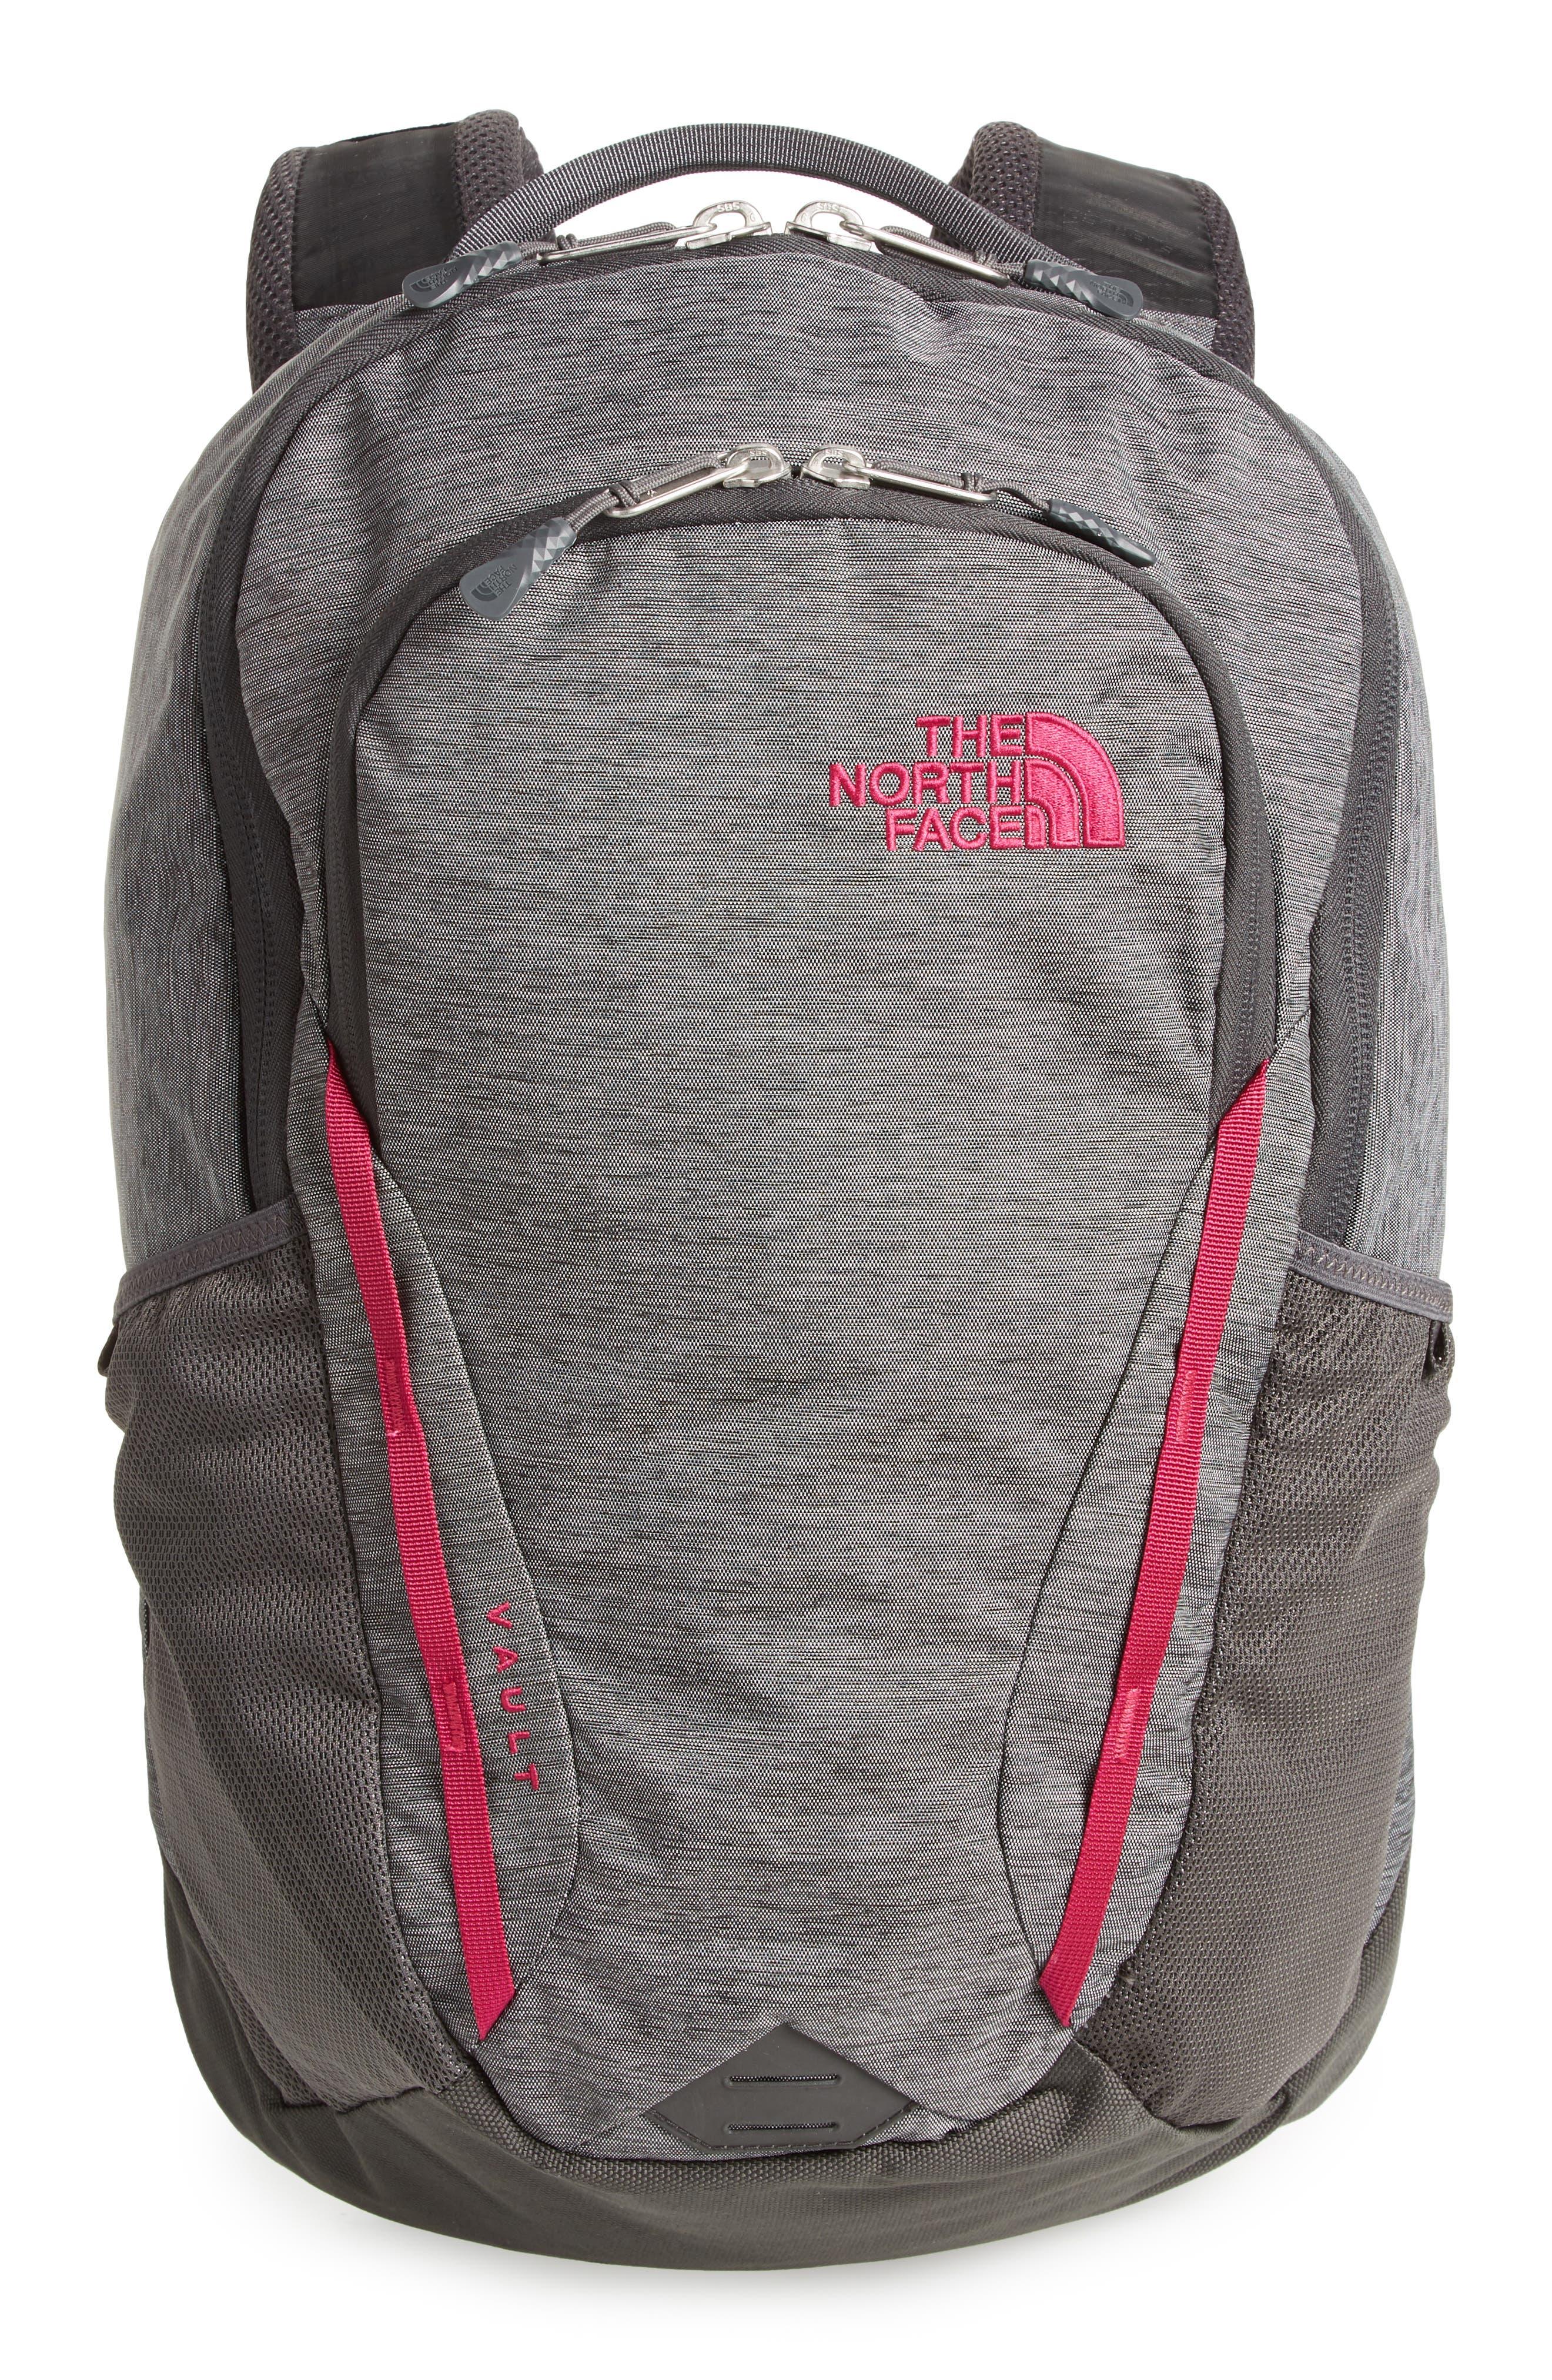 Vault Backpack,                             Main thumbnail 1, color,                             ASPHALT GREY/ DRAMATIC PLUM